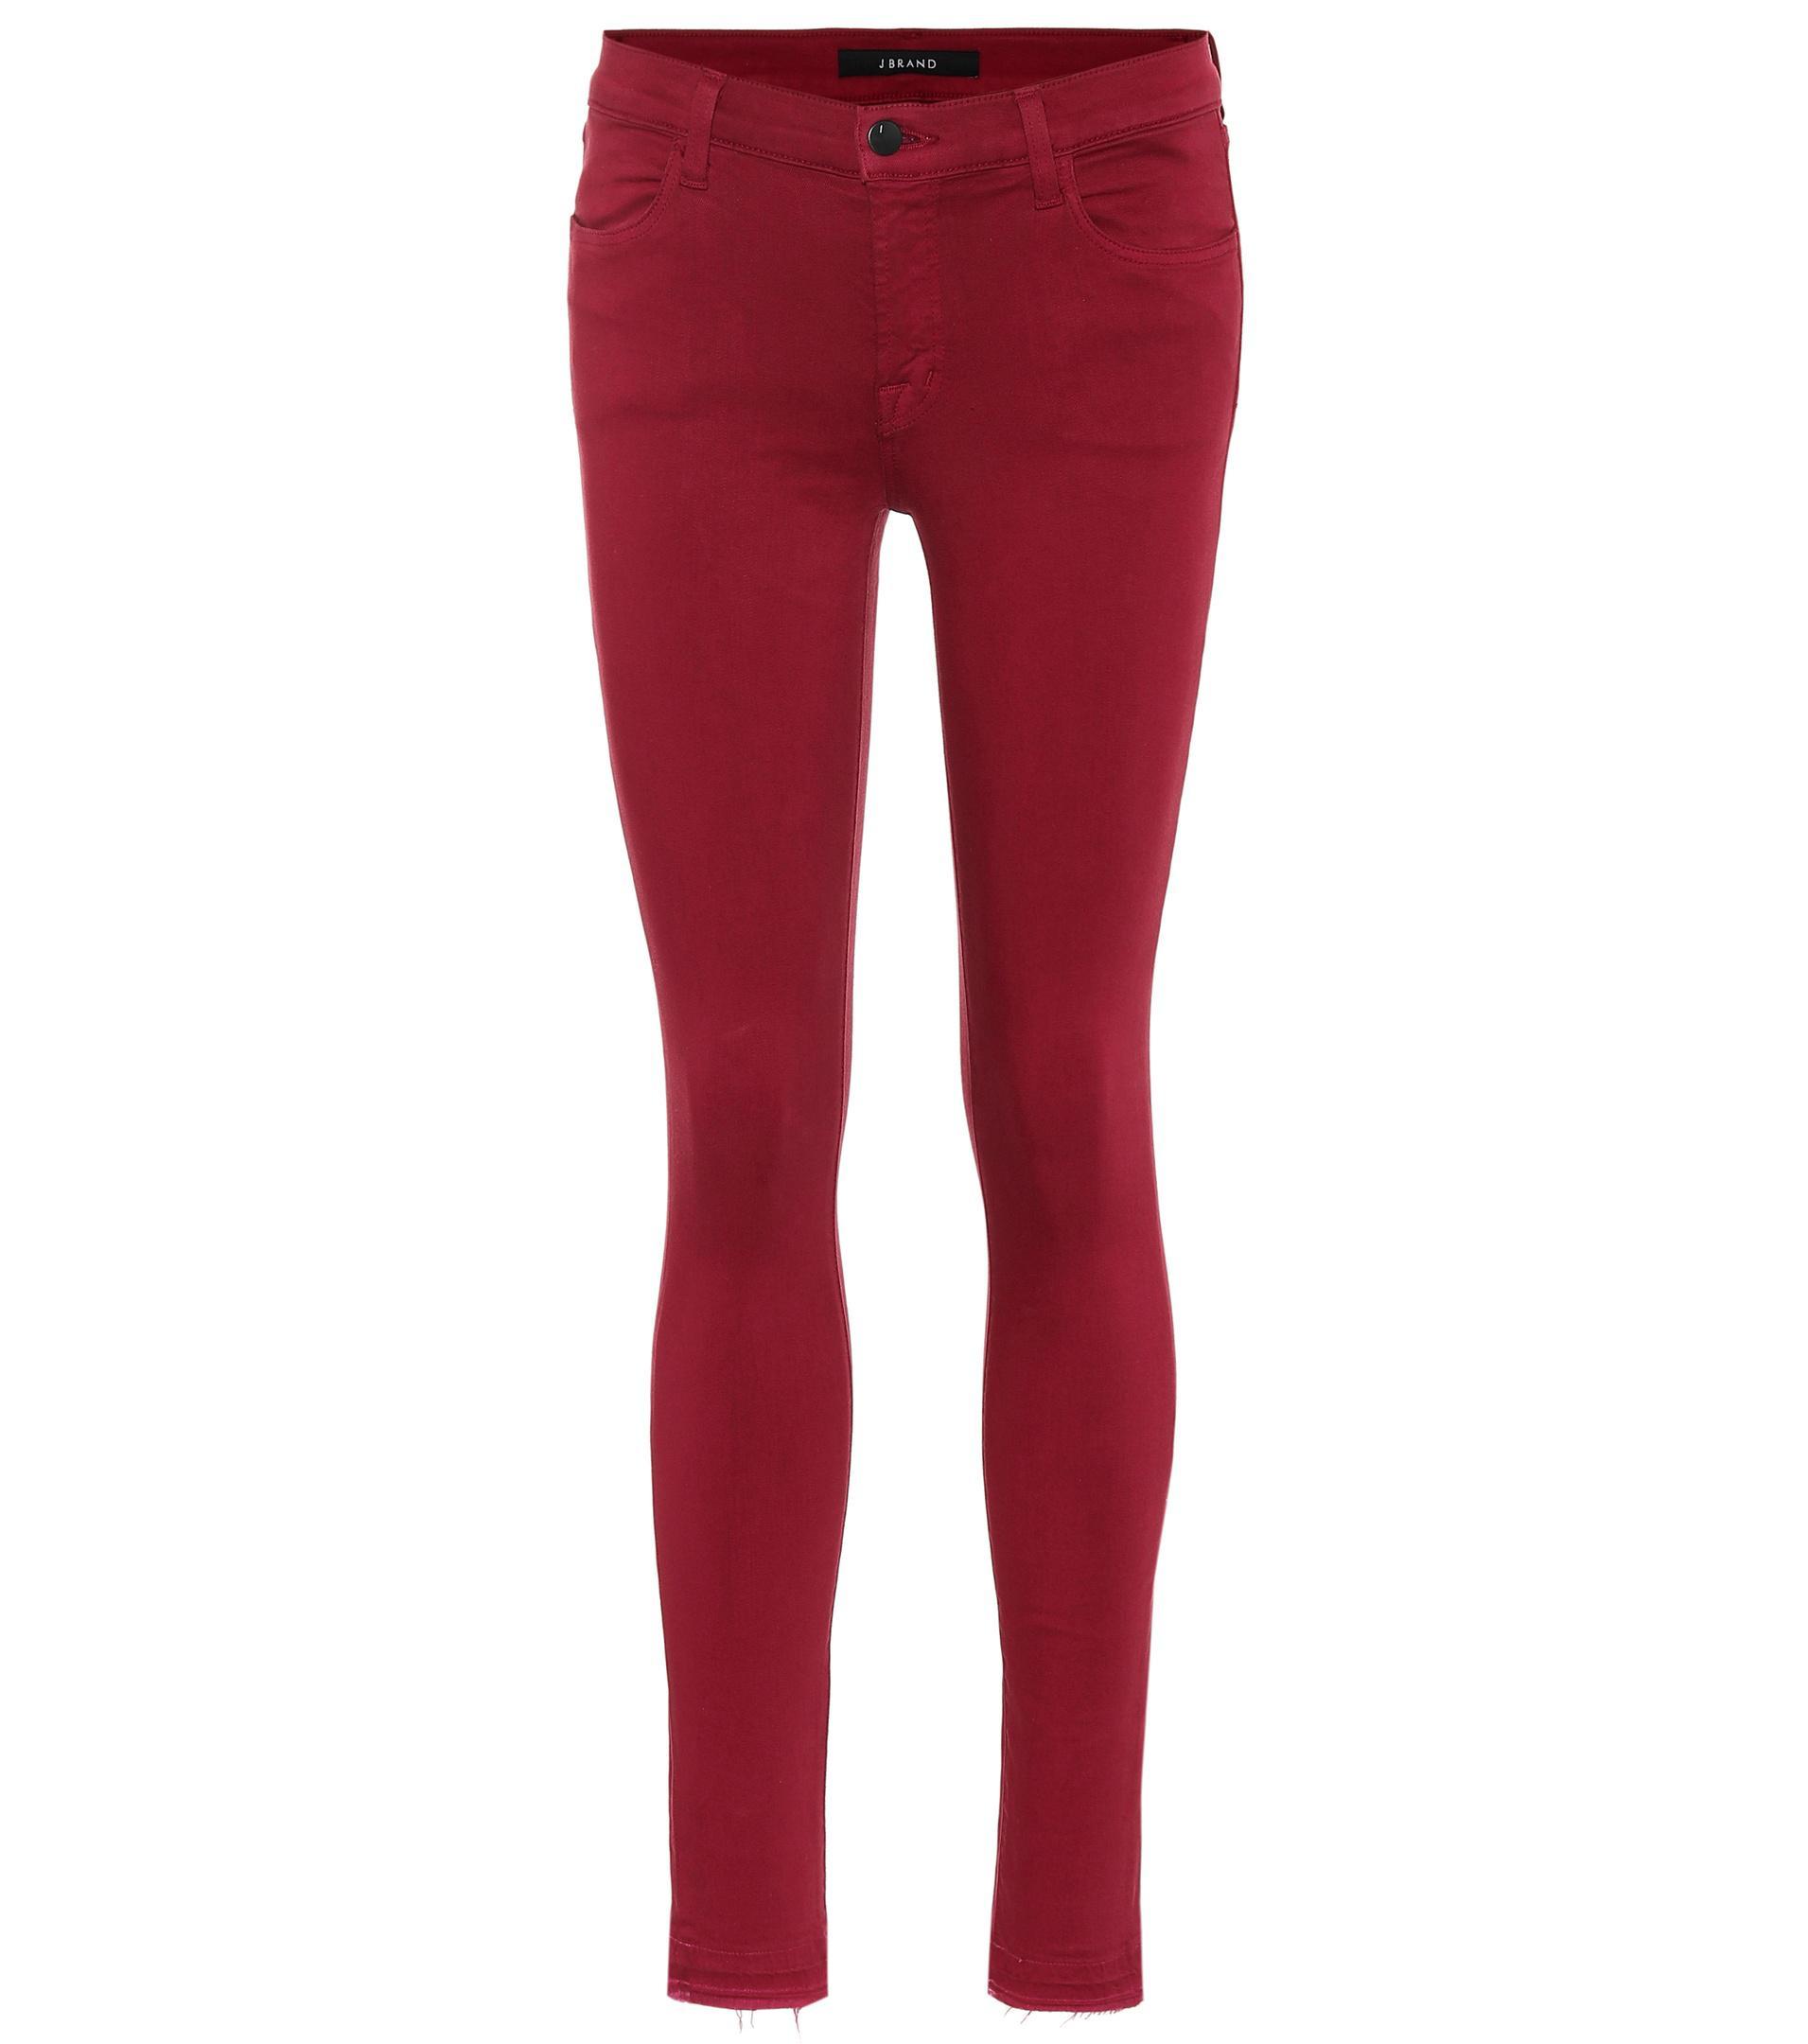 a68910f132ff8b Lyst - J Brand Jeans 620 Super Skinny in Lila